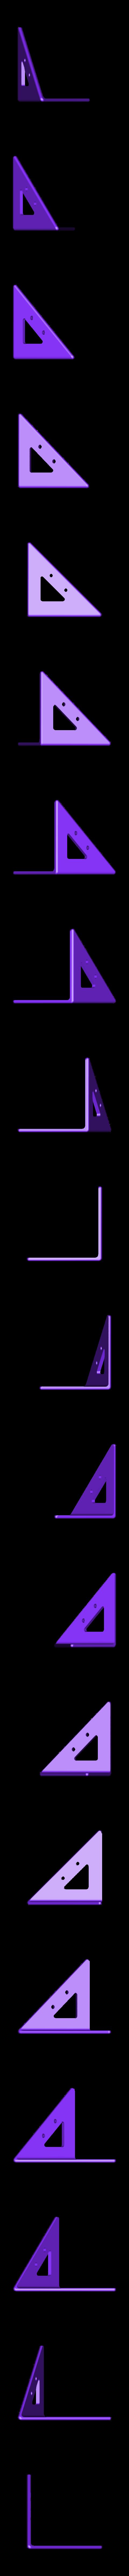 HE_Corner_bottom_stl.STL Download free STL file Heated enclosure corner • 3D printer object, Piva